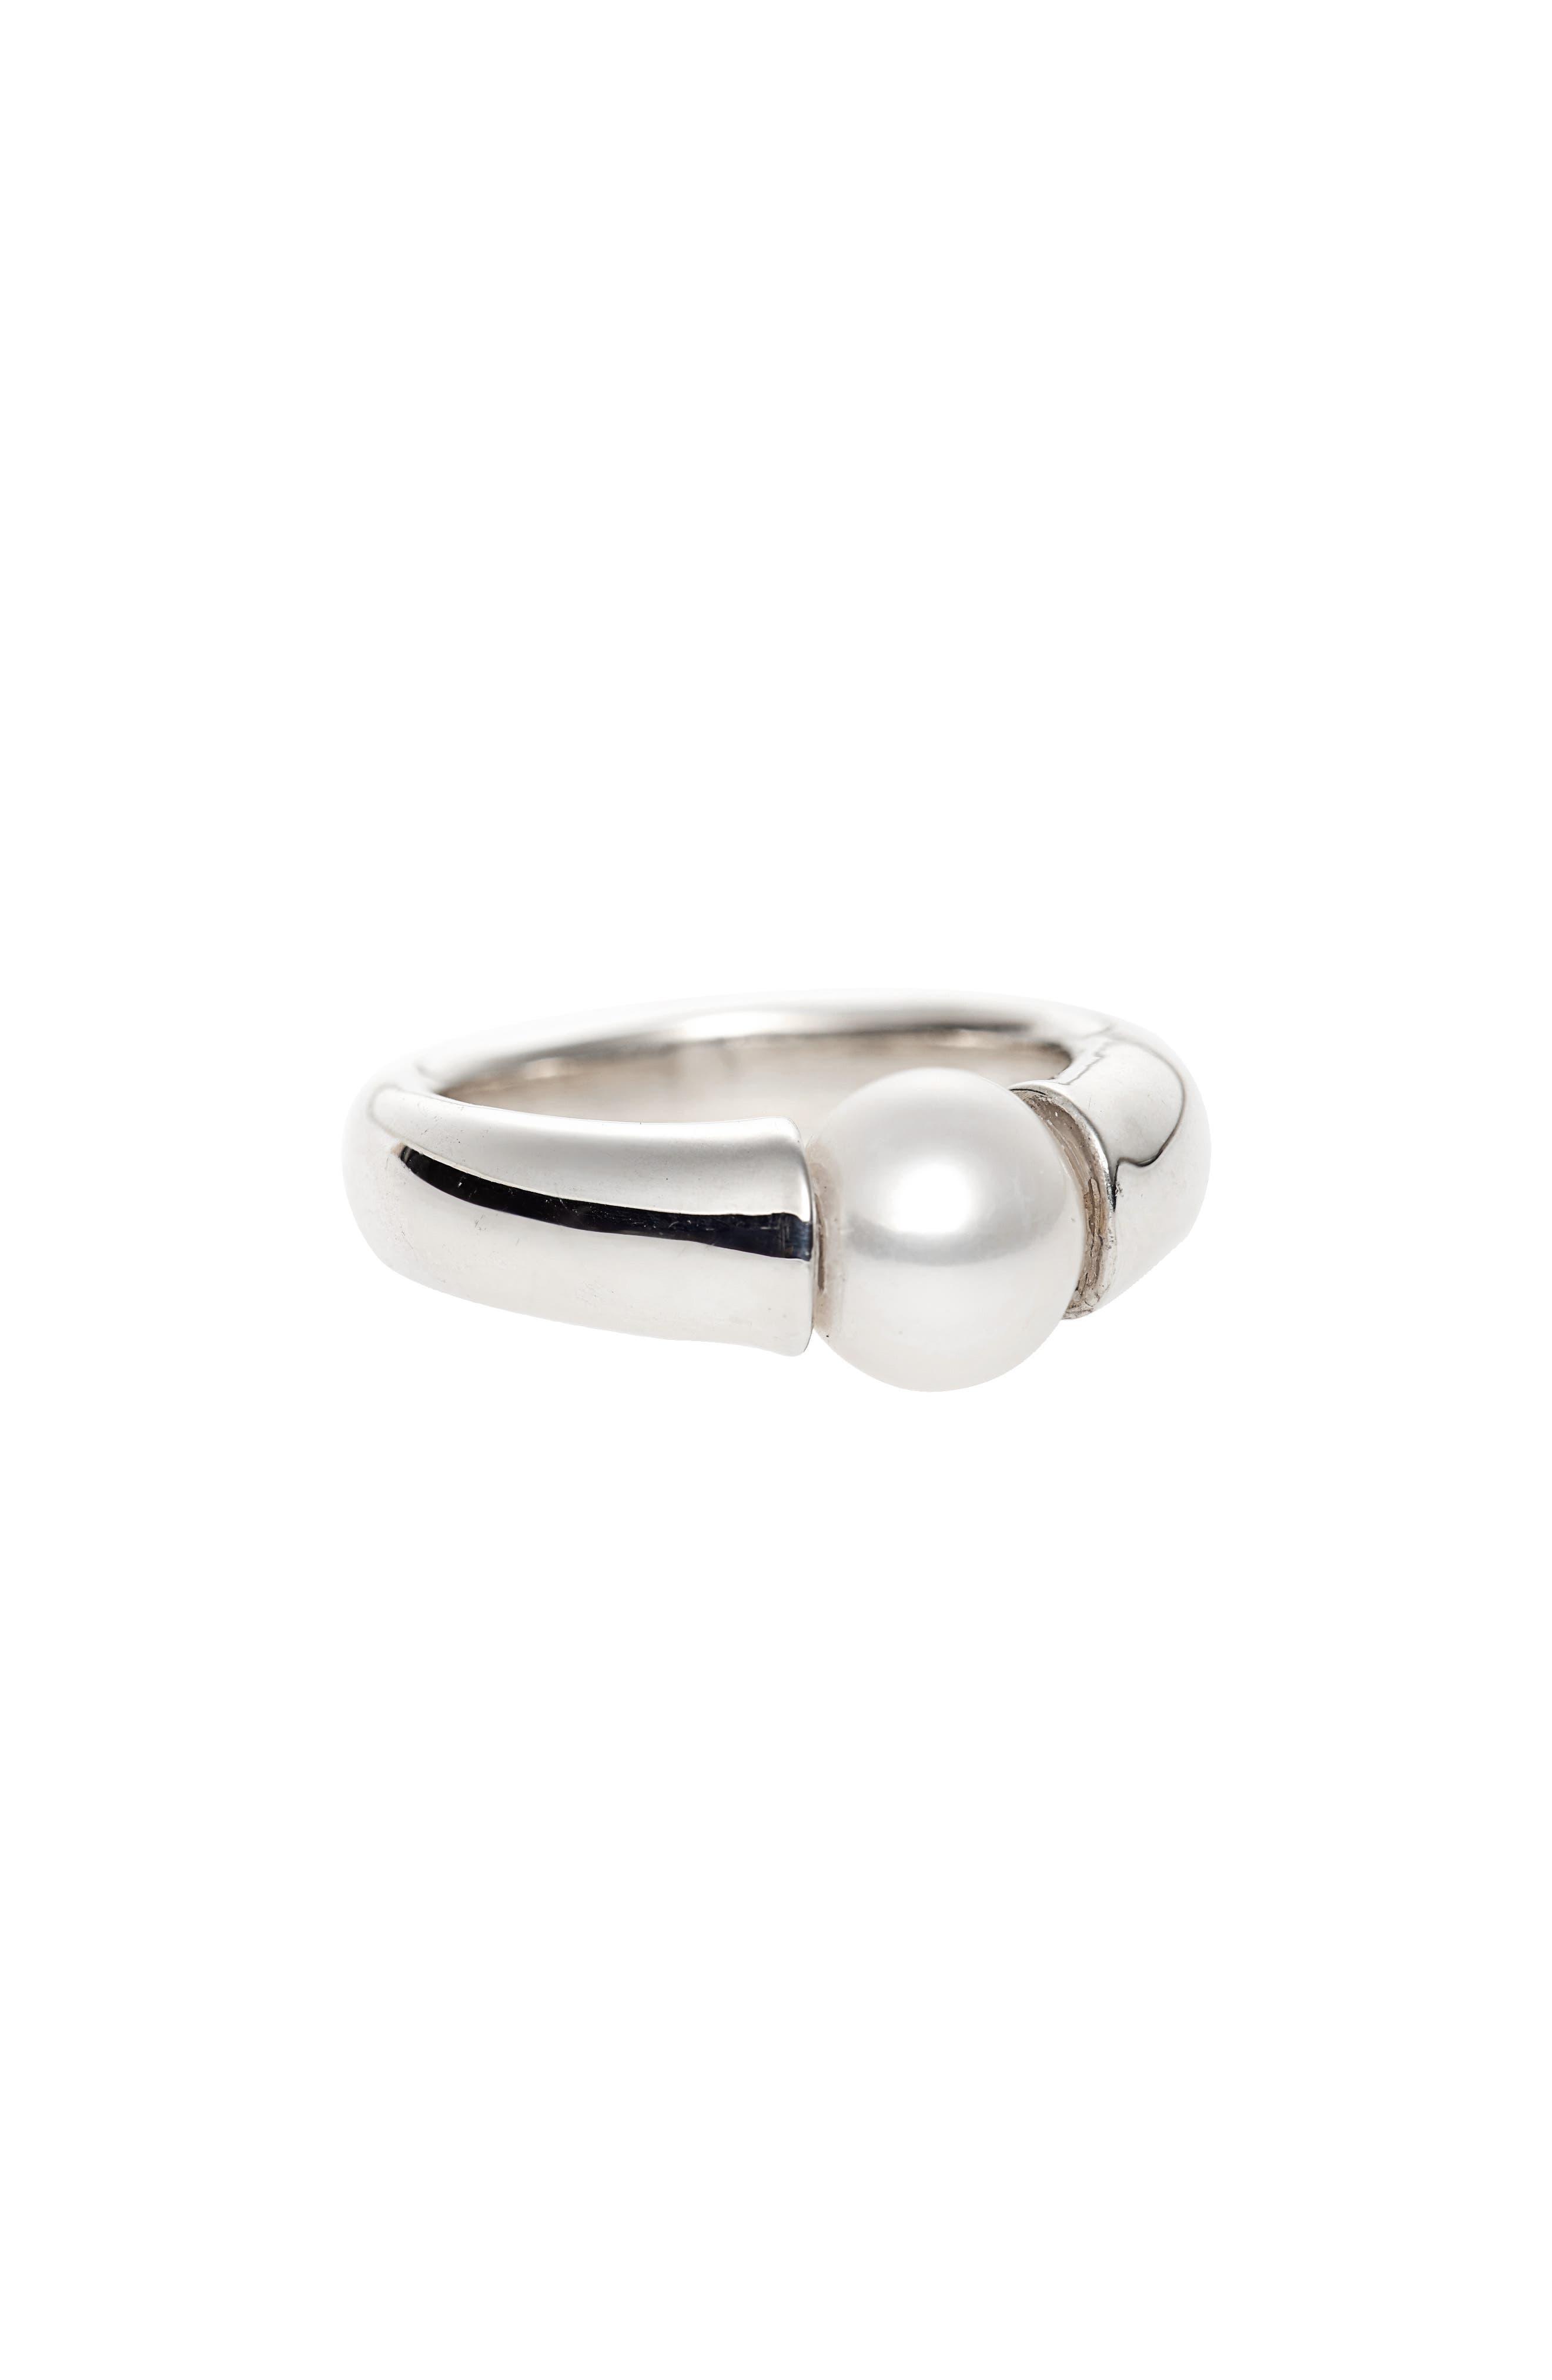 Vermeer Freshwater Pearl Ring,                             Main thumbnail 1, color,                             STERLING SILVER/ FRSHWTR PRL